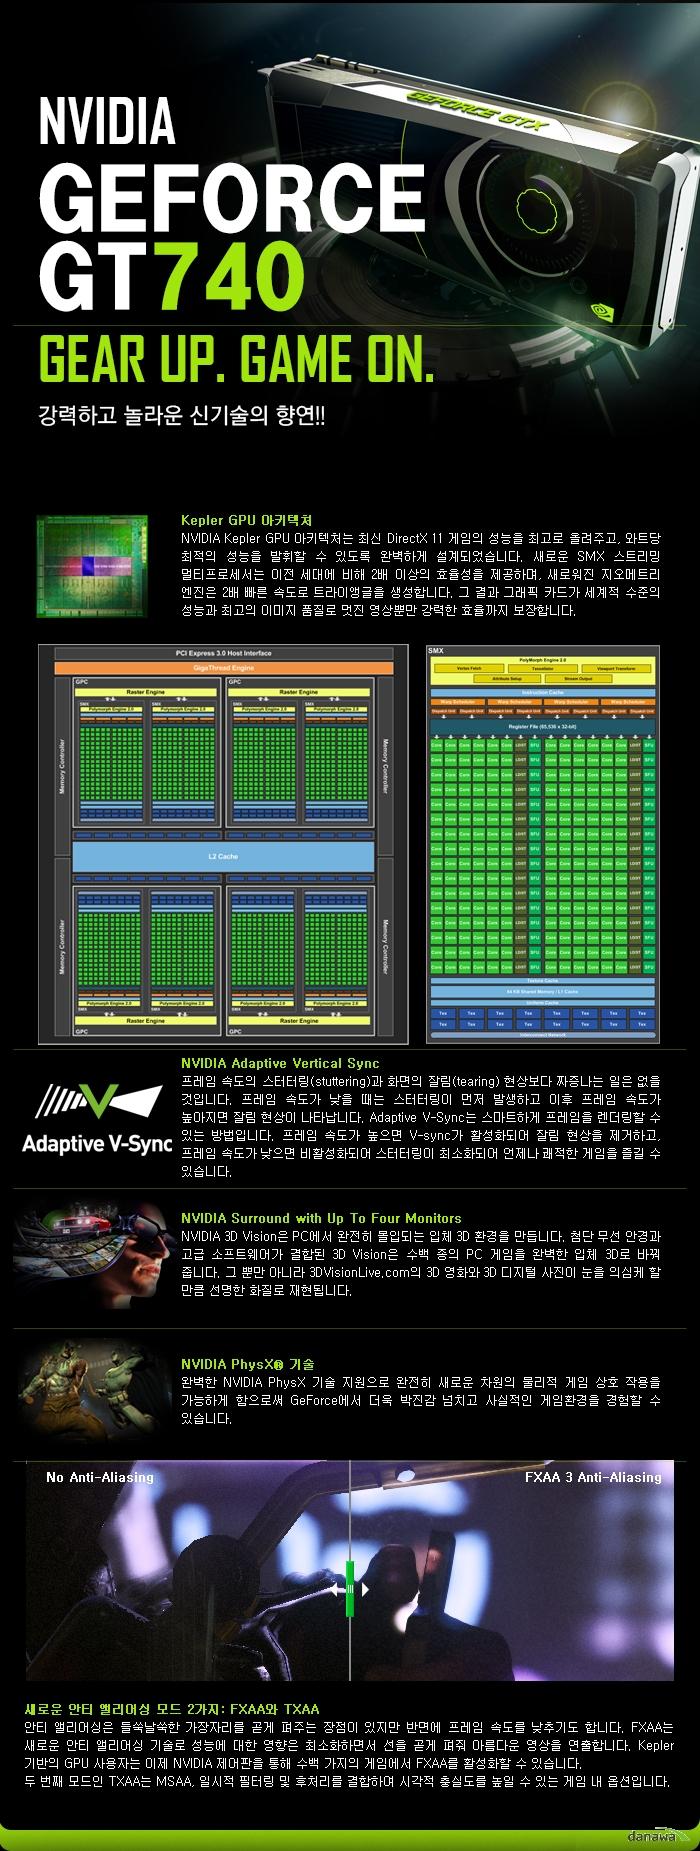 GIGABYTE 지포스 GT 740 UD2 D5 WING-100 제품 기술설명